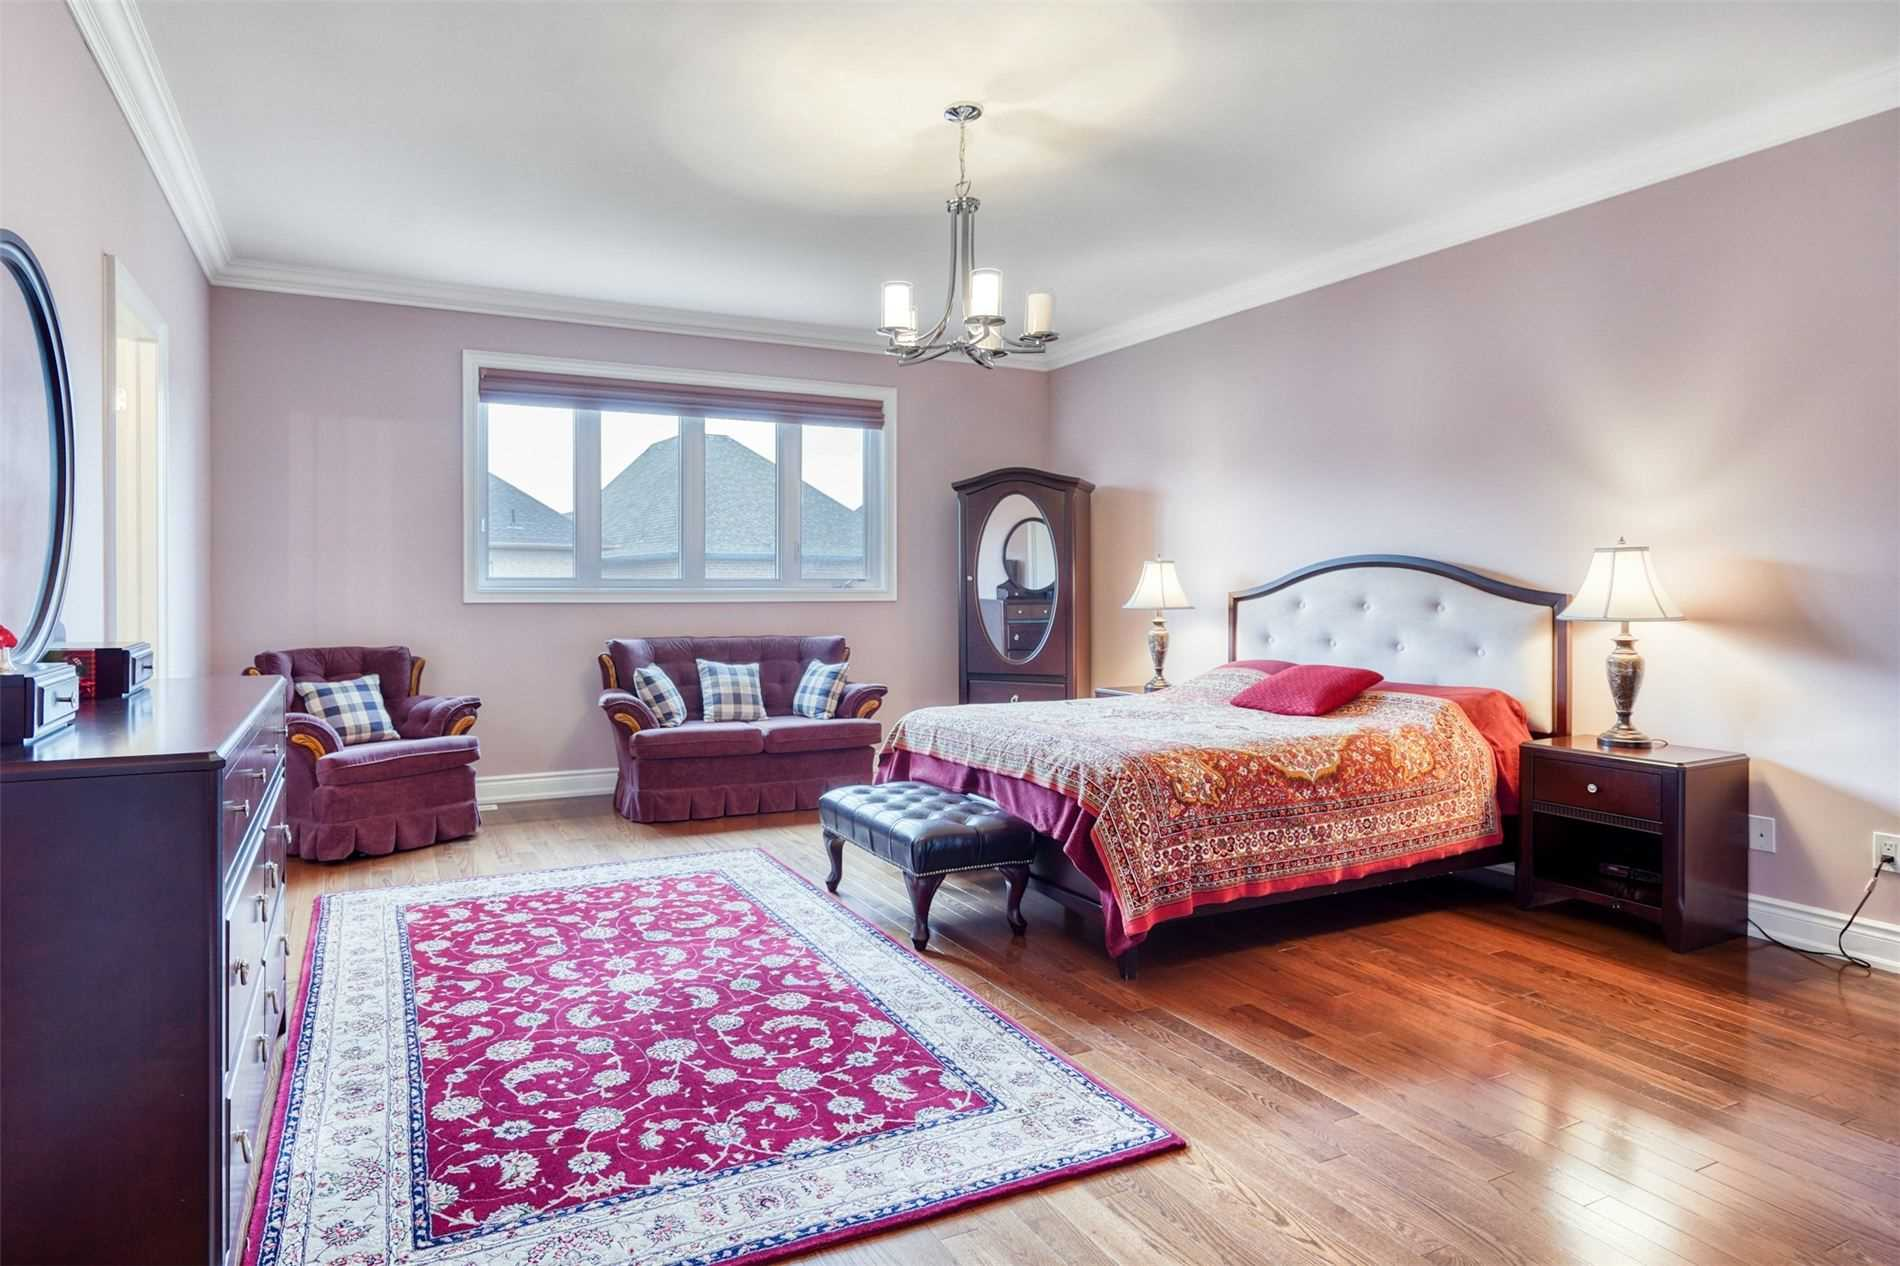 599 Pleasant Ridge Ave   House Sold Price   Realmaster.com